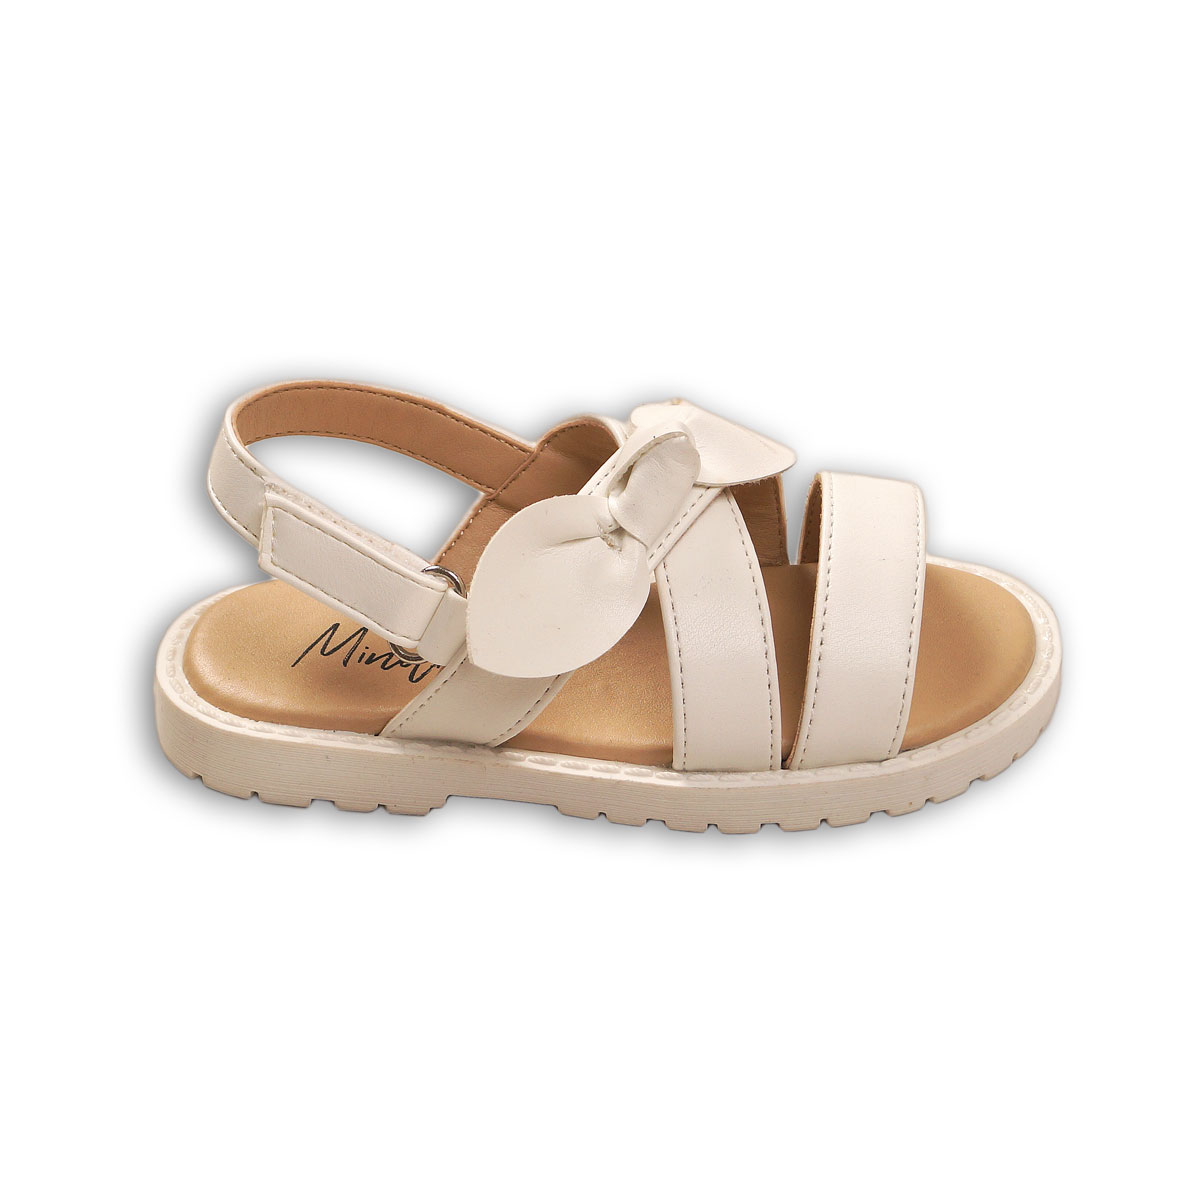 Sandale in curele si funda aplicata, Minoti Shoe